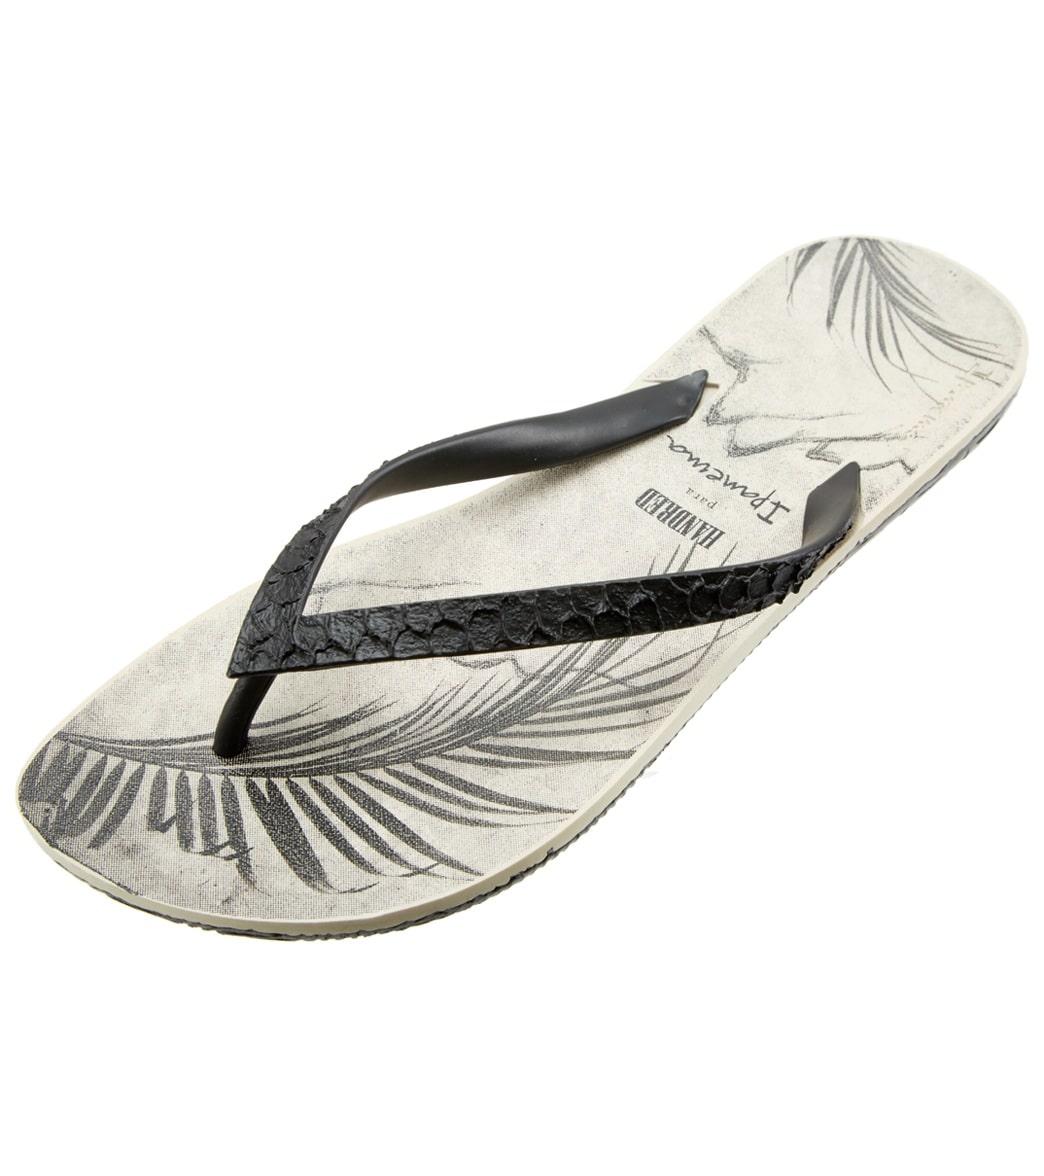 358578365ad5 Ipanema RJ Basic Men s Flip Flop at Swimoutlet.com